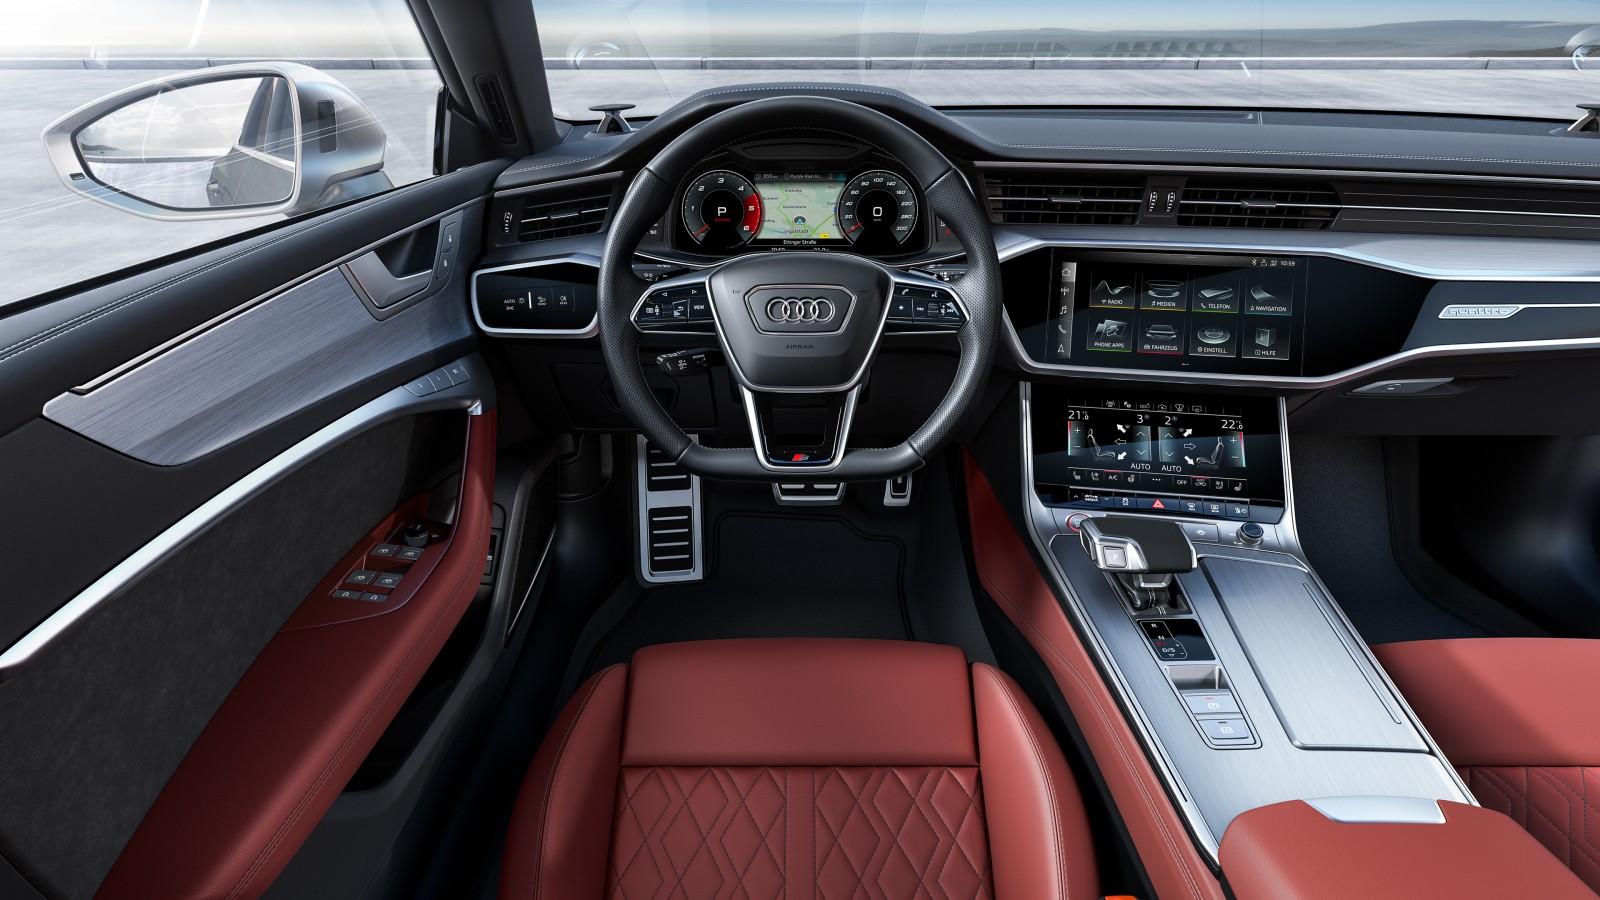 Audi S7 Sportback TDI 2019 4K Interior Wallpaper | HD Car ...